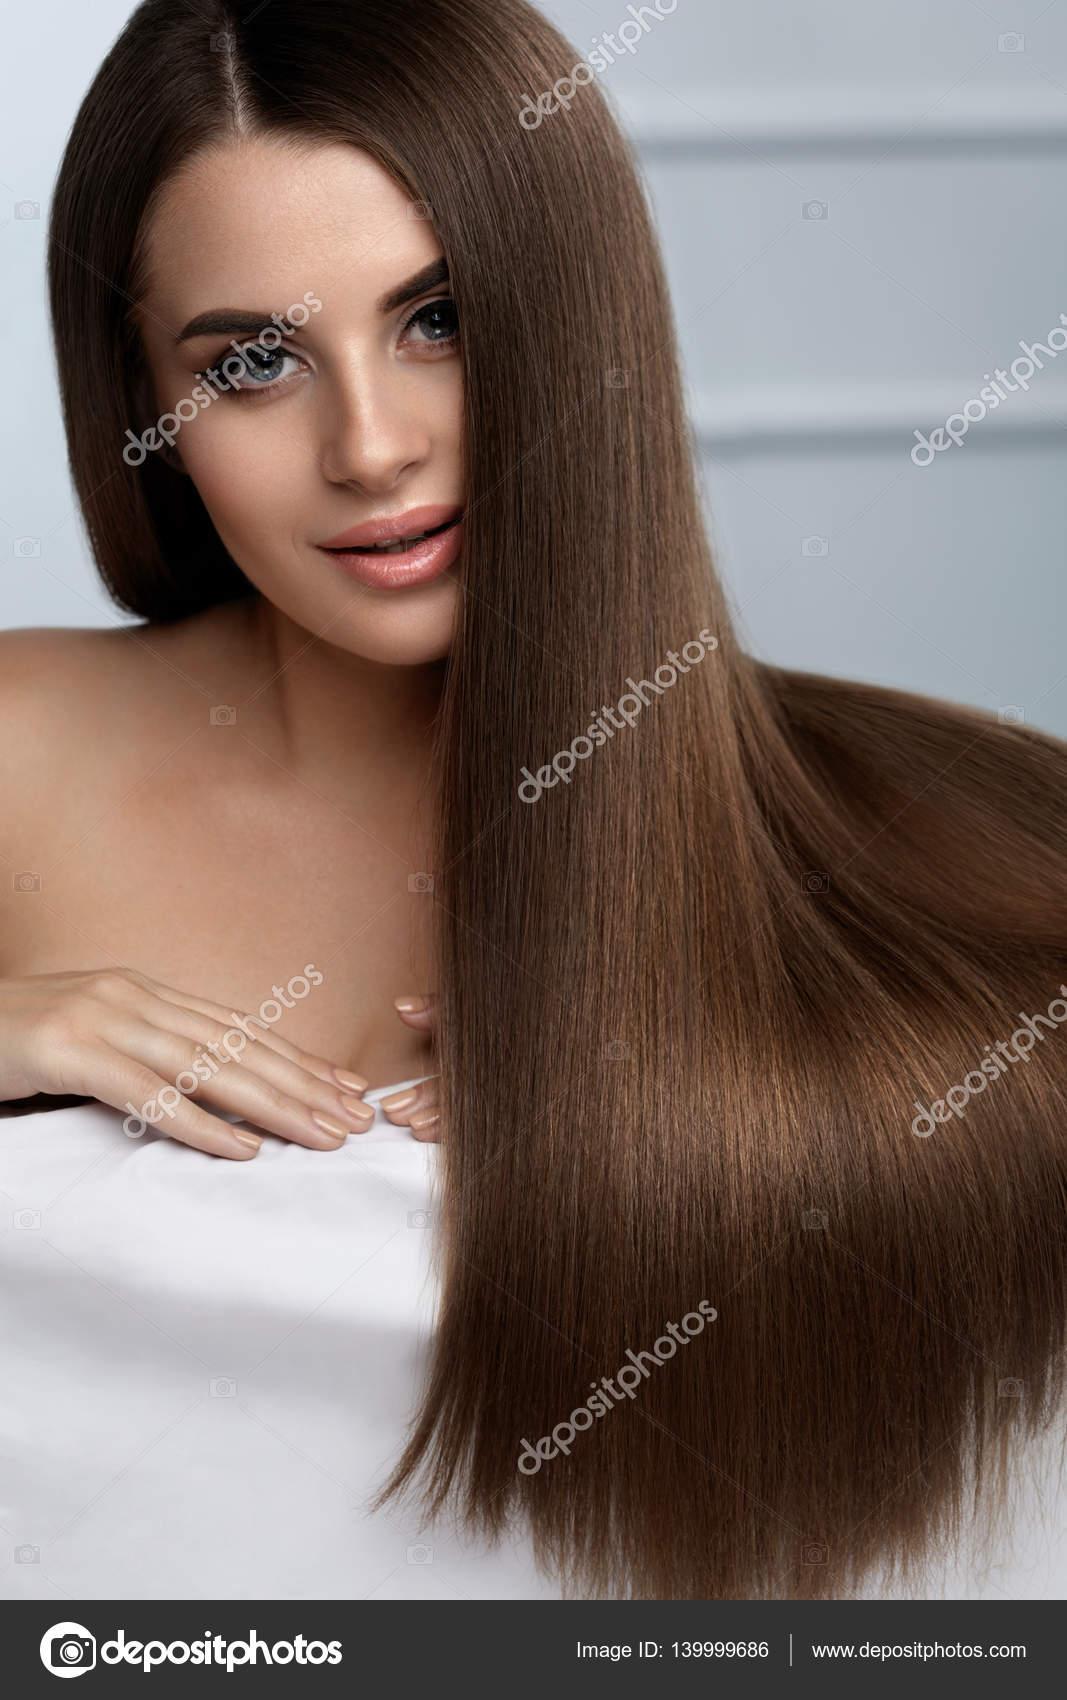 Gesunde glanzende lange haare